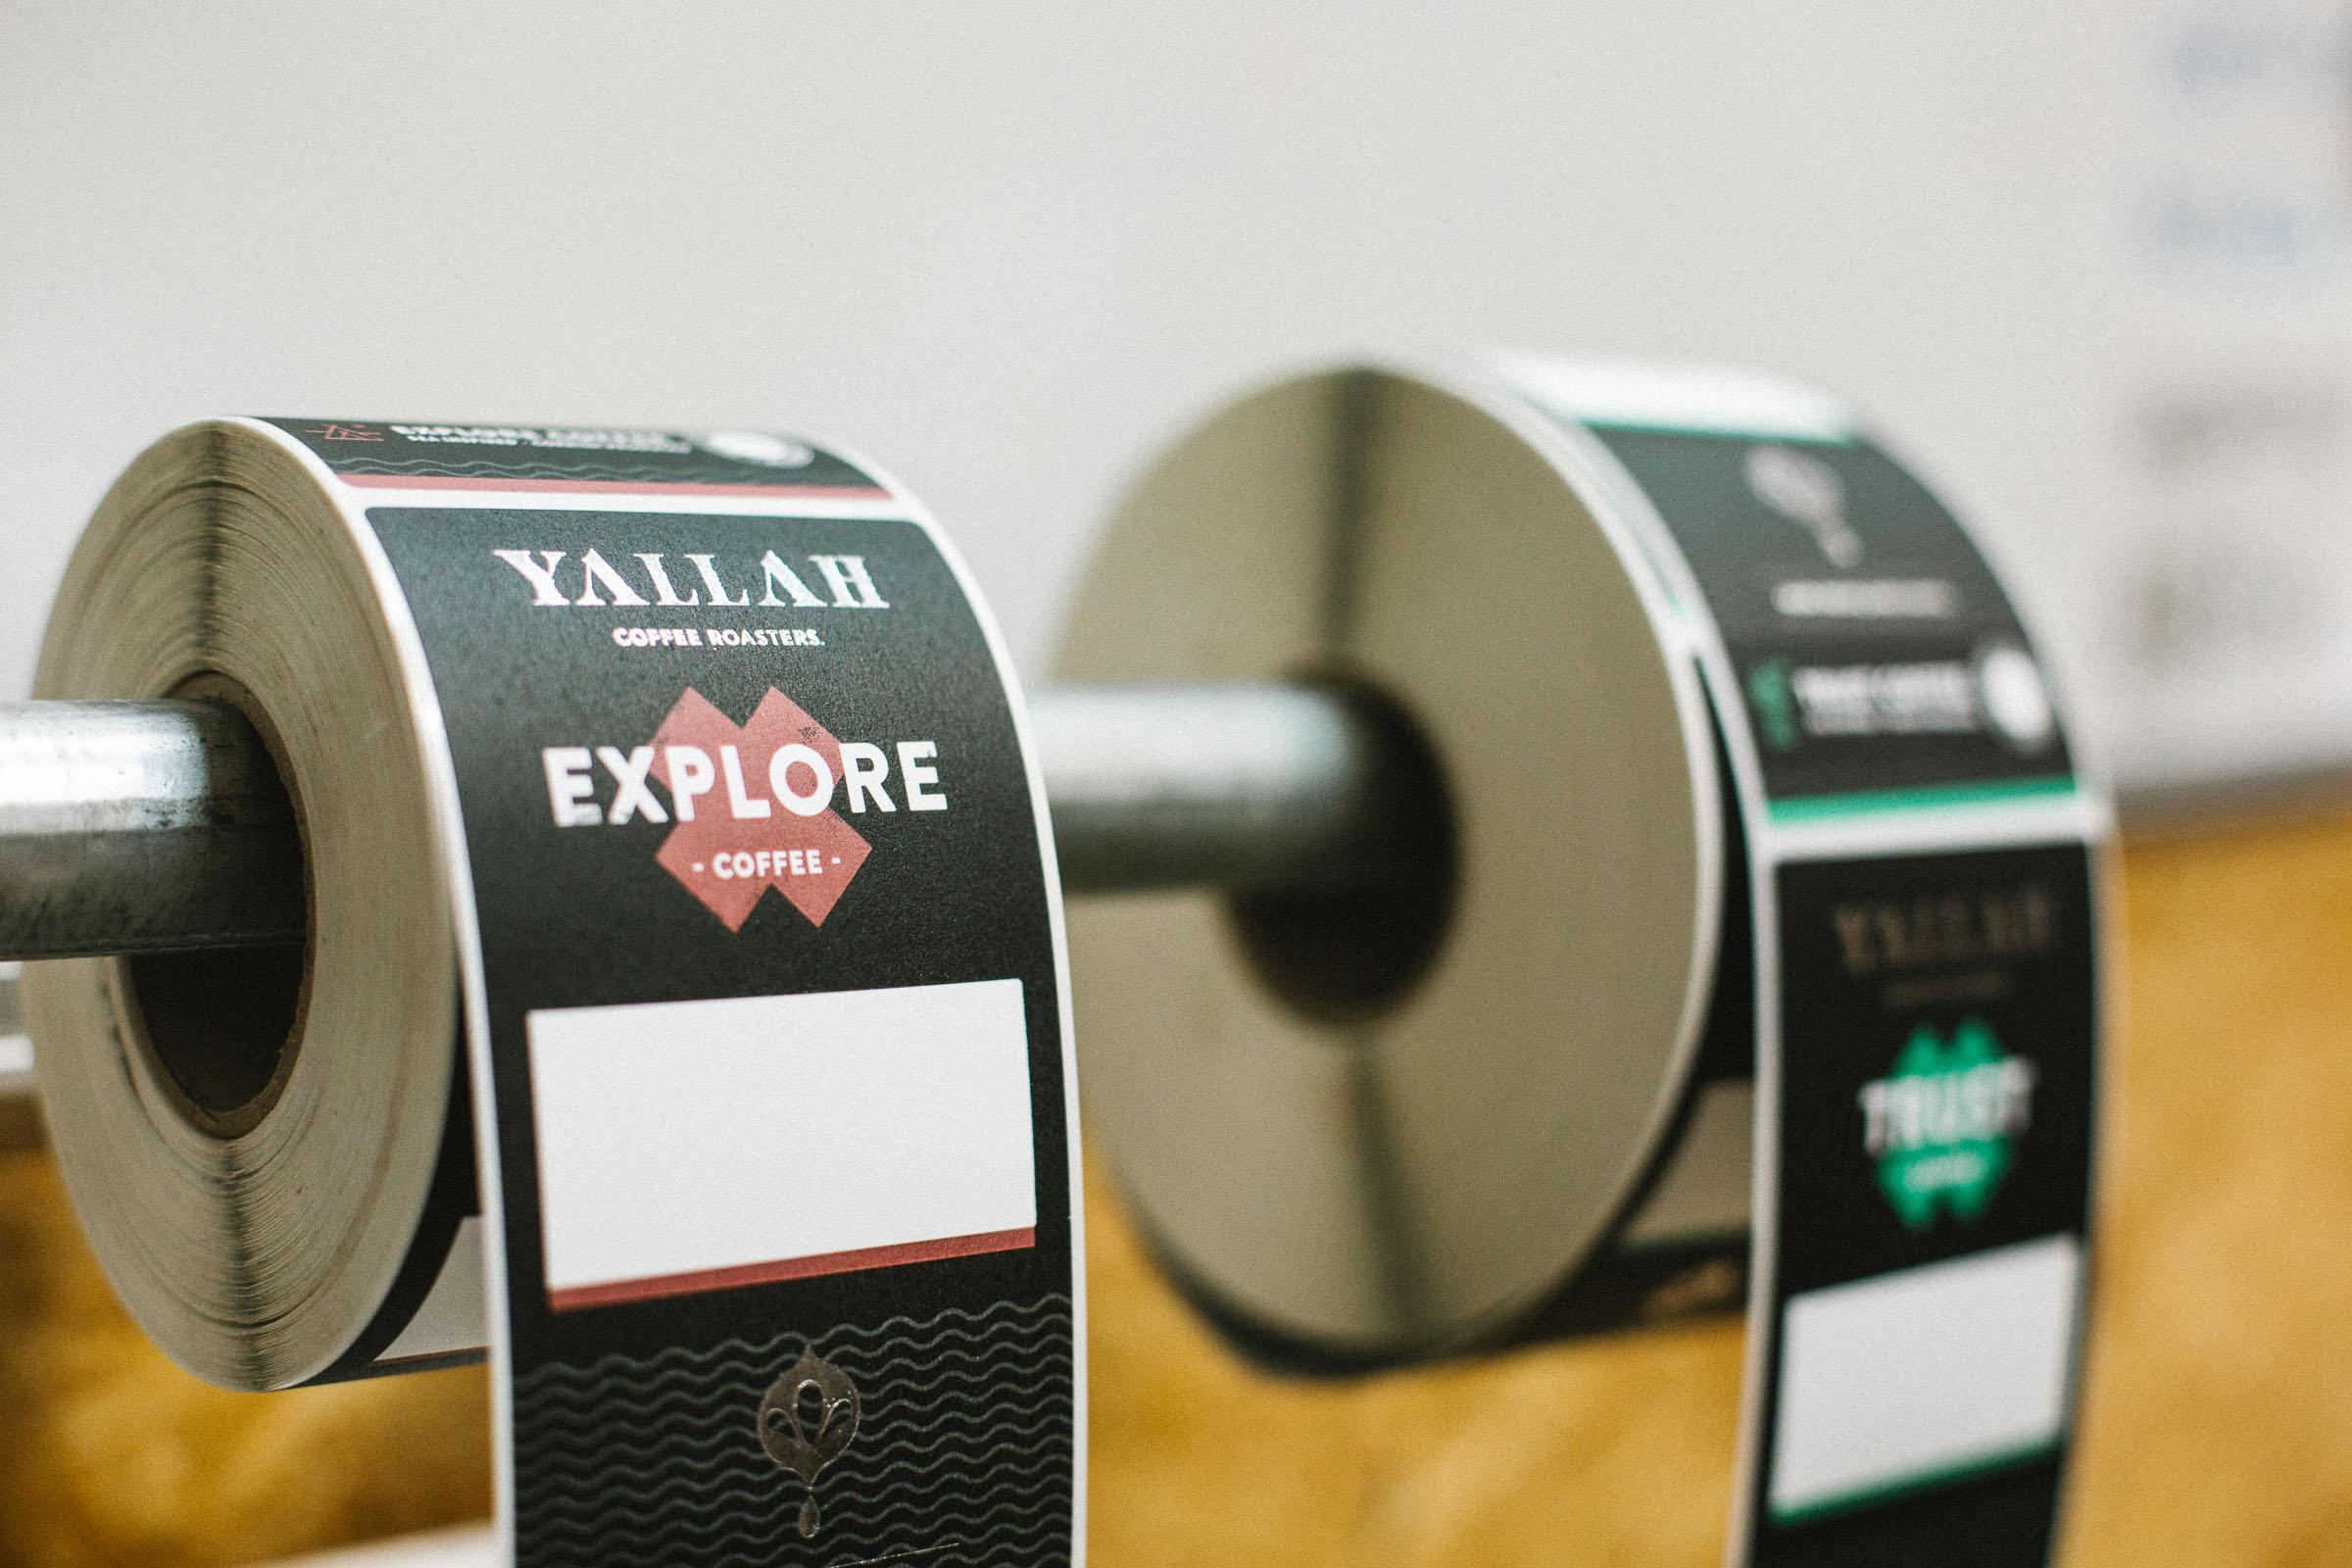 Yallah_Visit-49.jpg